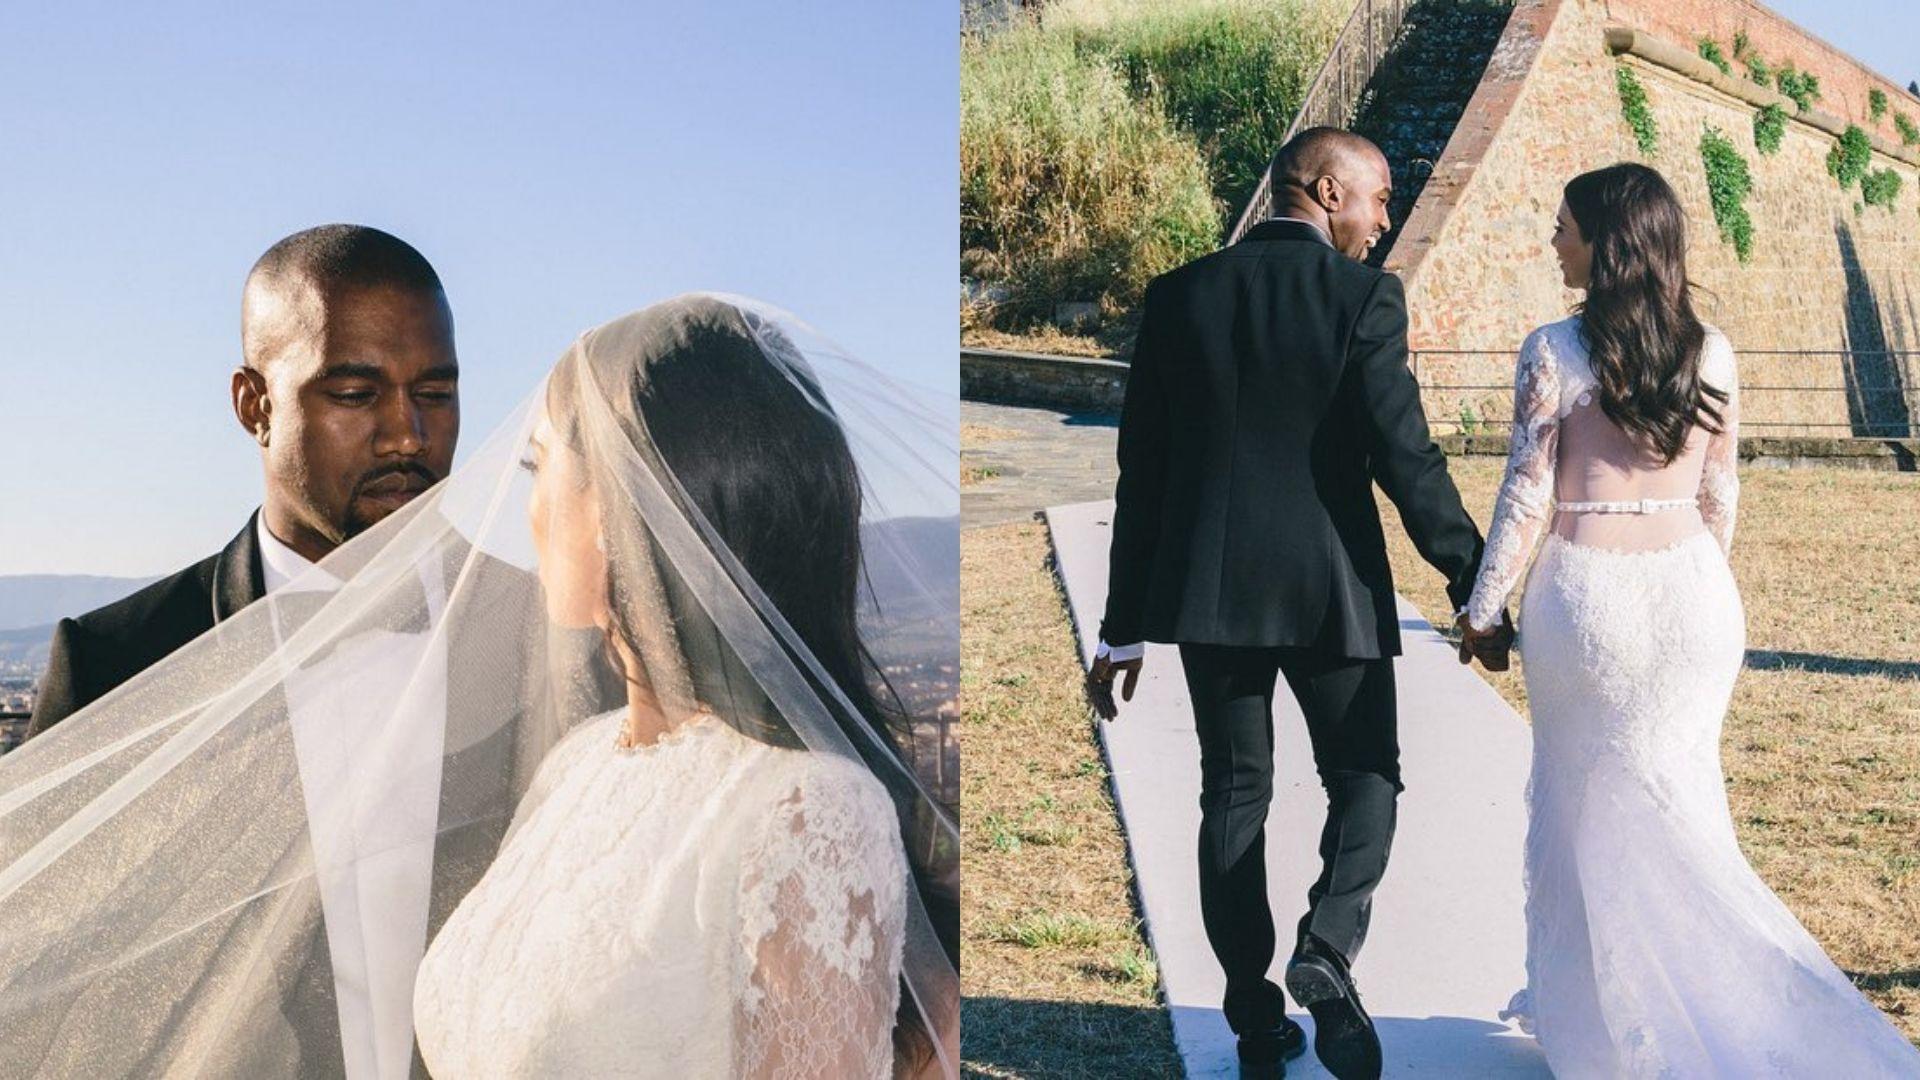 Kim Kardashian And Kanye West Just Renewed Their Wedding Vows In Secret